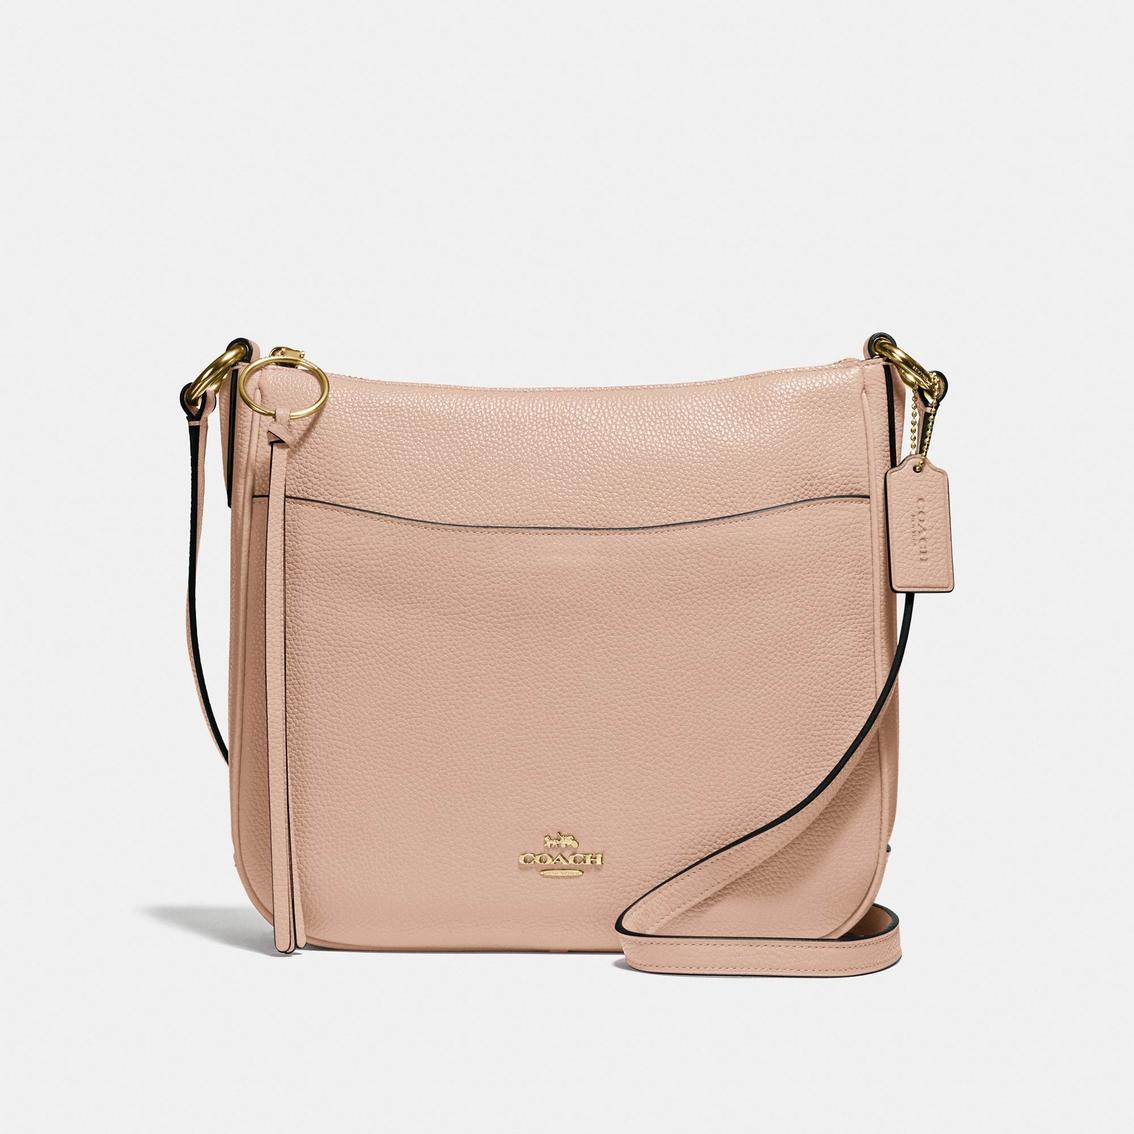 1343a13508ba1 Coach Chaise Crossbody Pebble Leather Handbag | Crossbody Bags ...